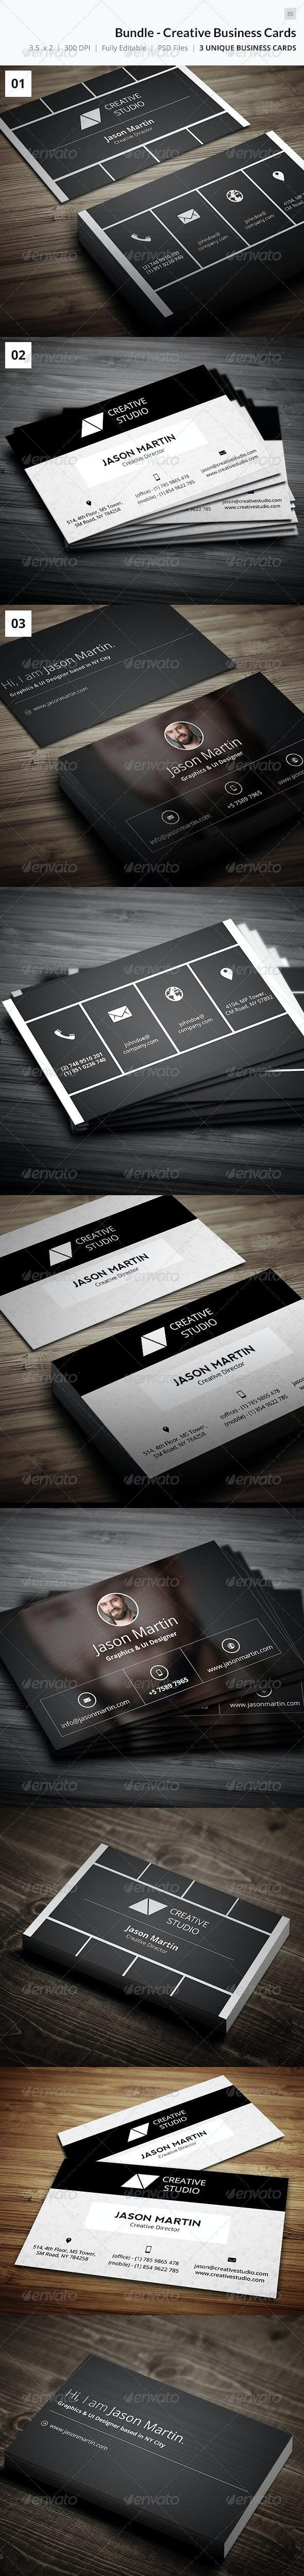 Bundle - Creative Business Cards - 35 - Creative Business Cards